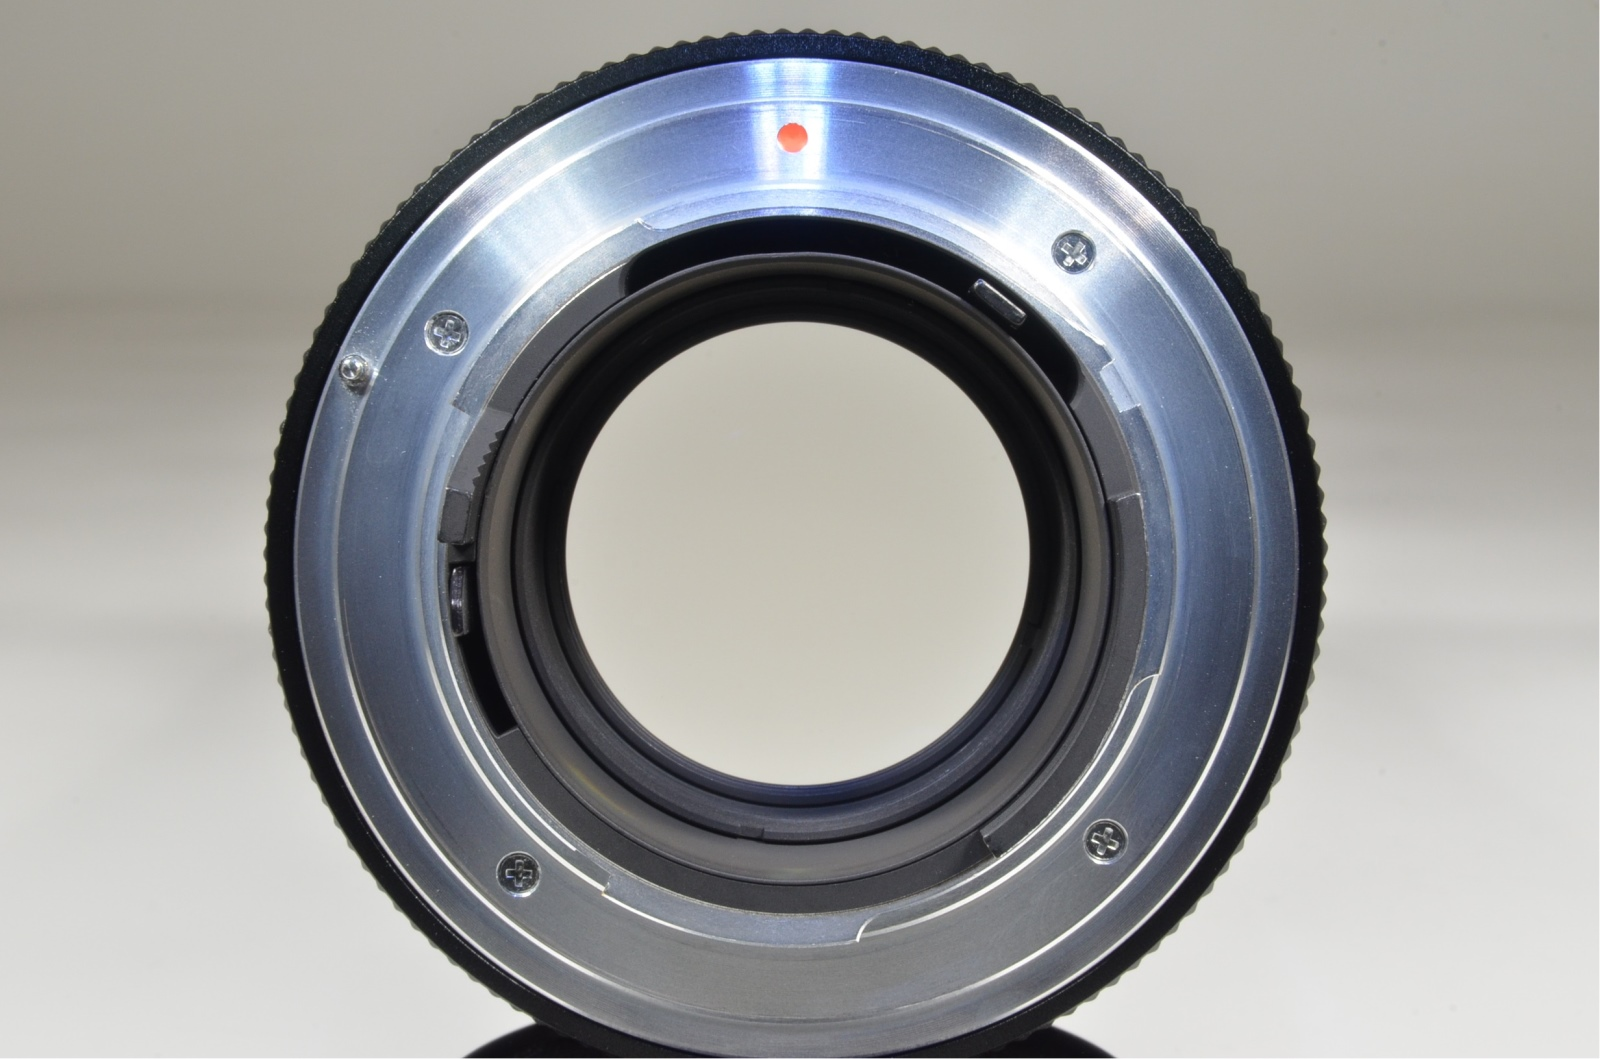 contax carl zeiss planar t* 135mm f2 mmg